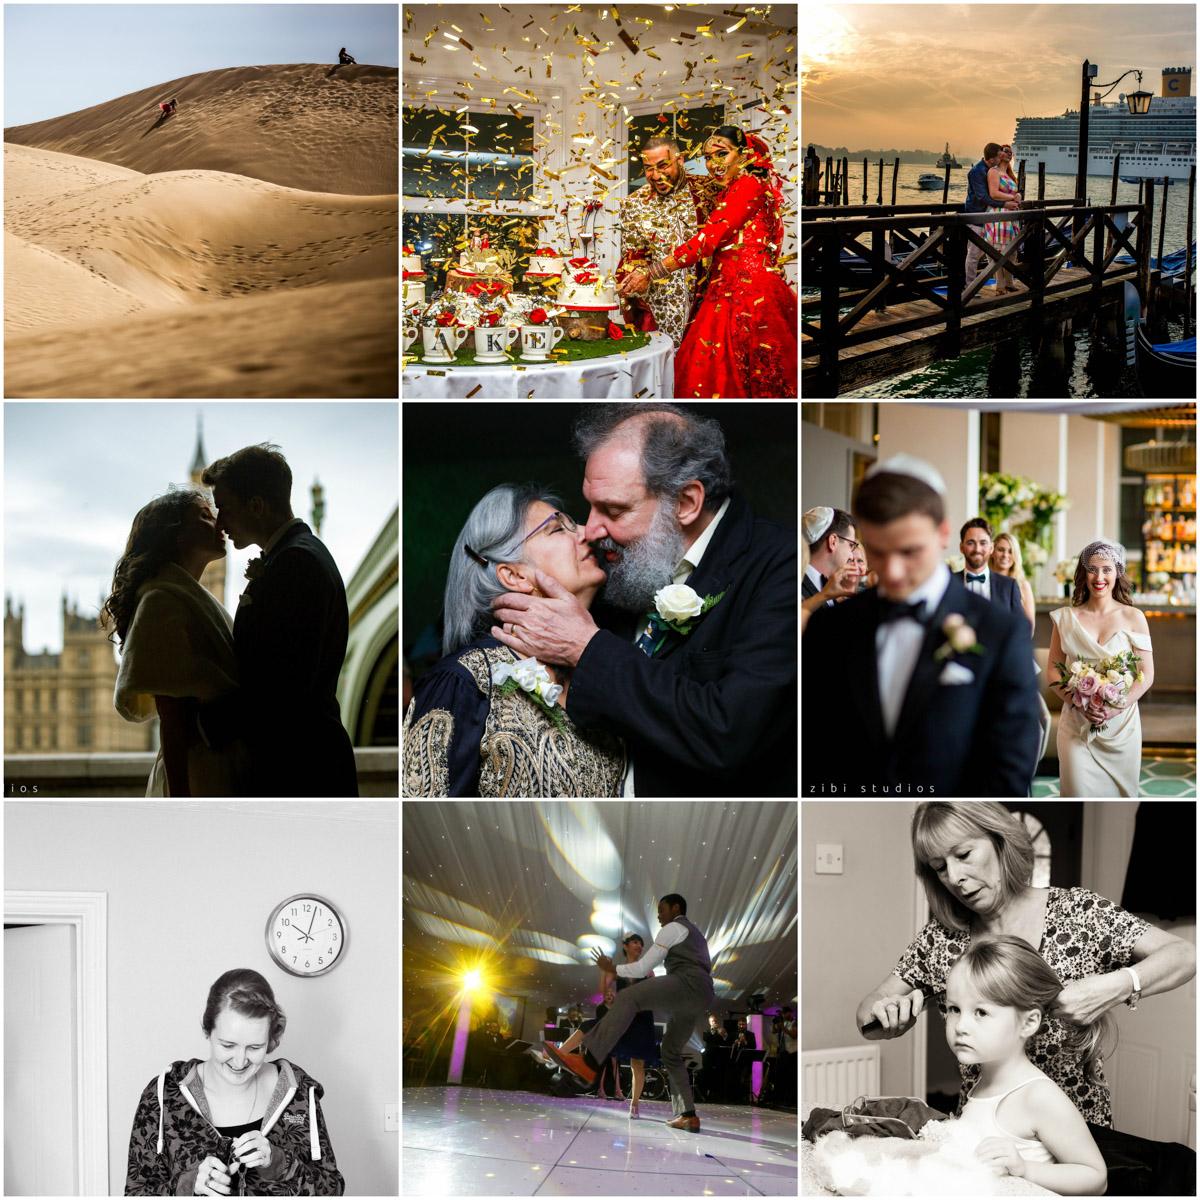 wedding photographer london on instagram